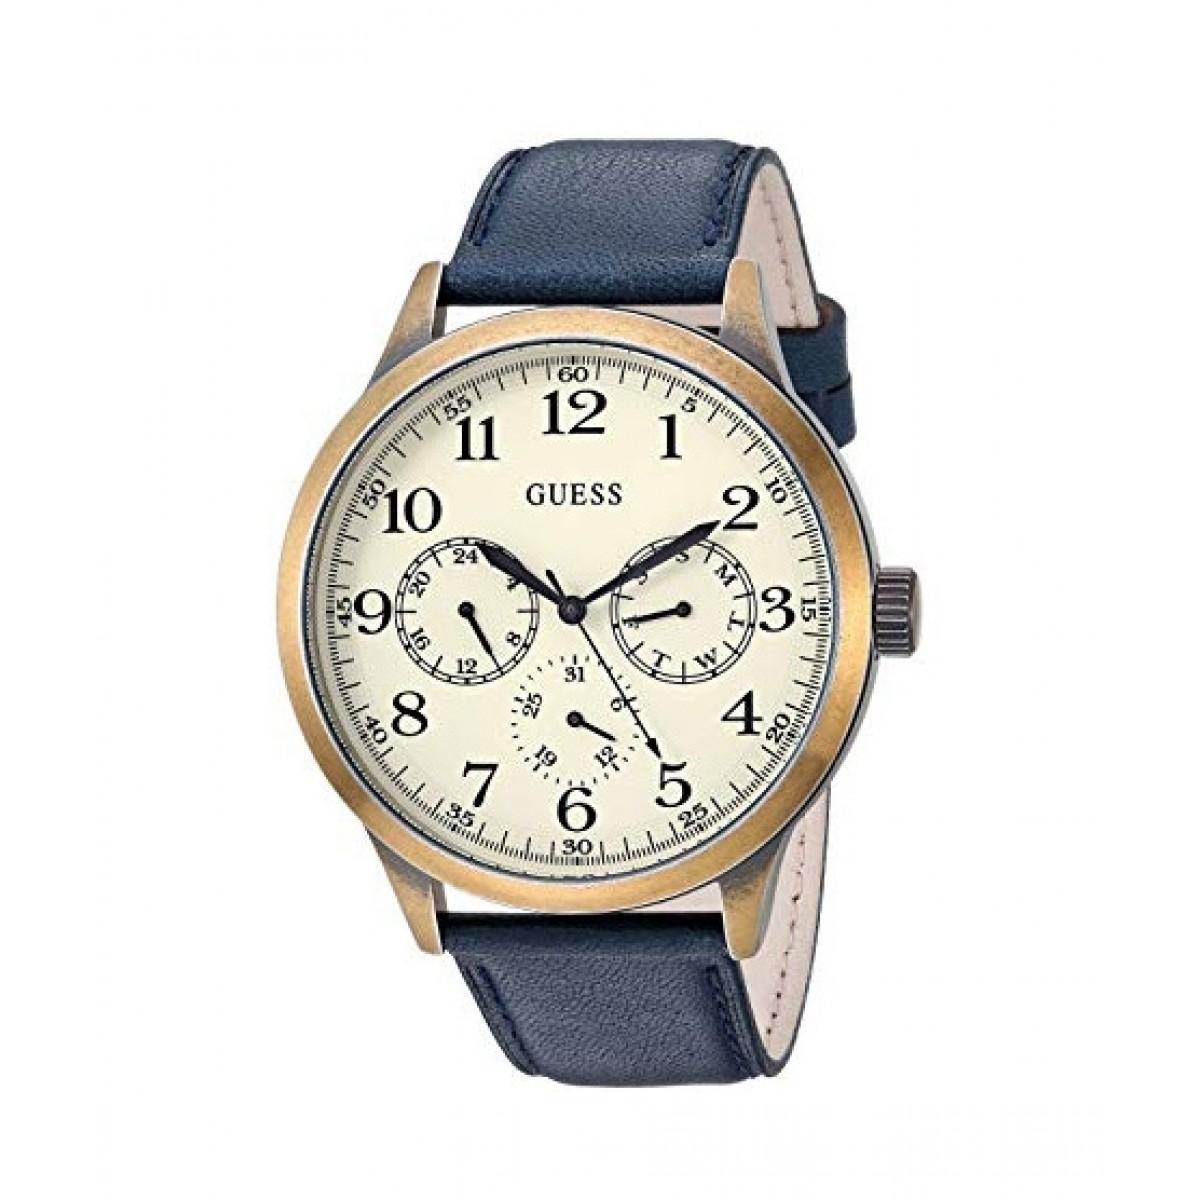 Guess Quartz Men's Watch Gold-Tone (U1101G2)